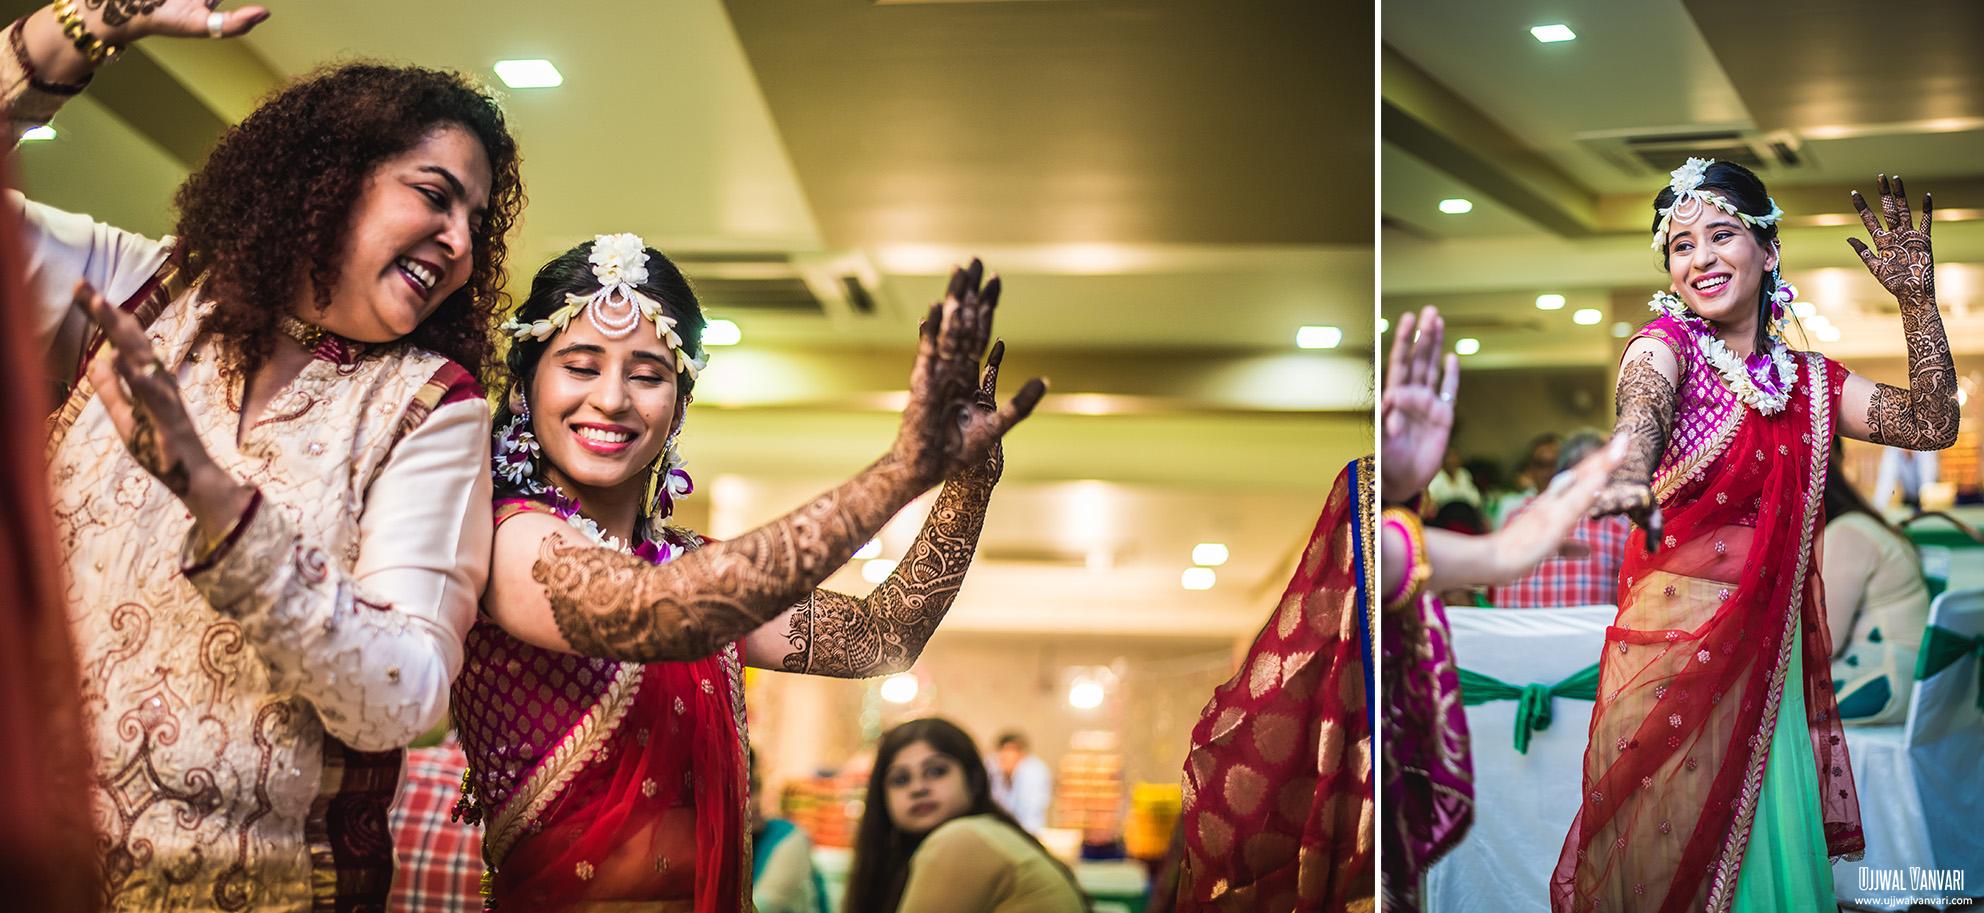 Candid Photographer in Lucknow | Mannat & Rishabh Wedding | Candid Photography